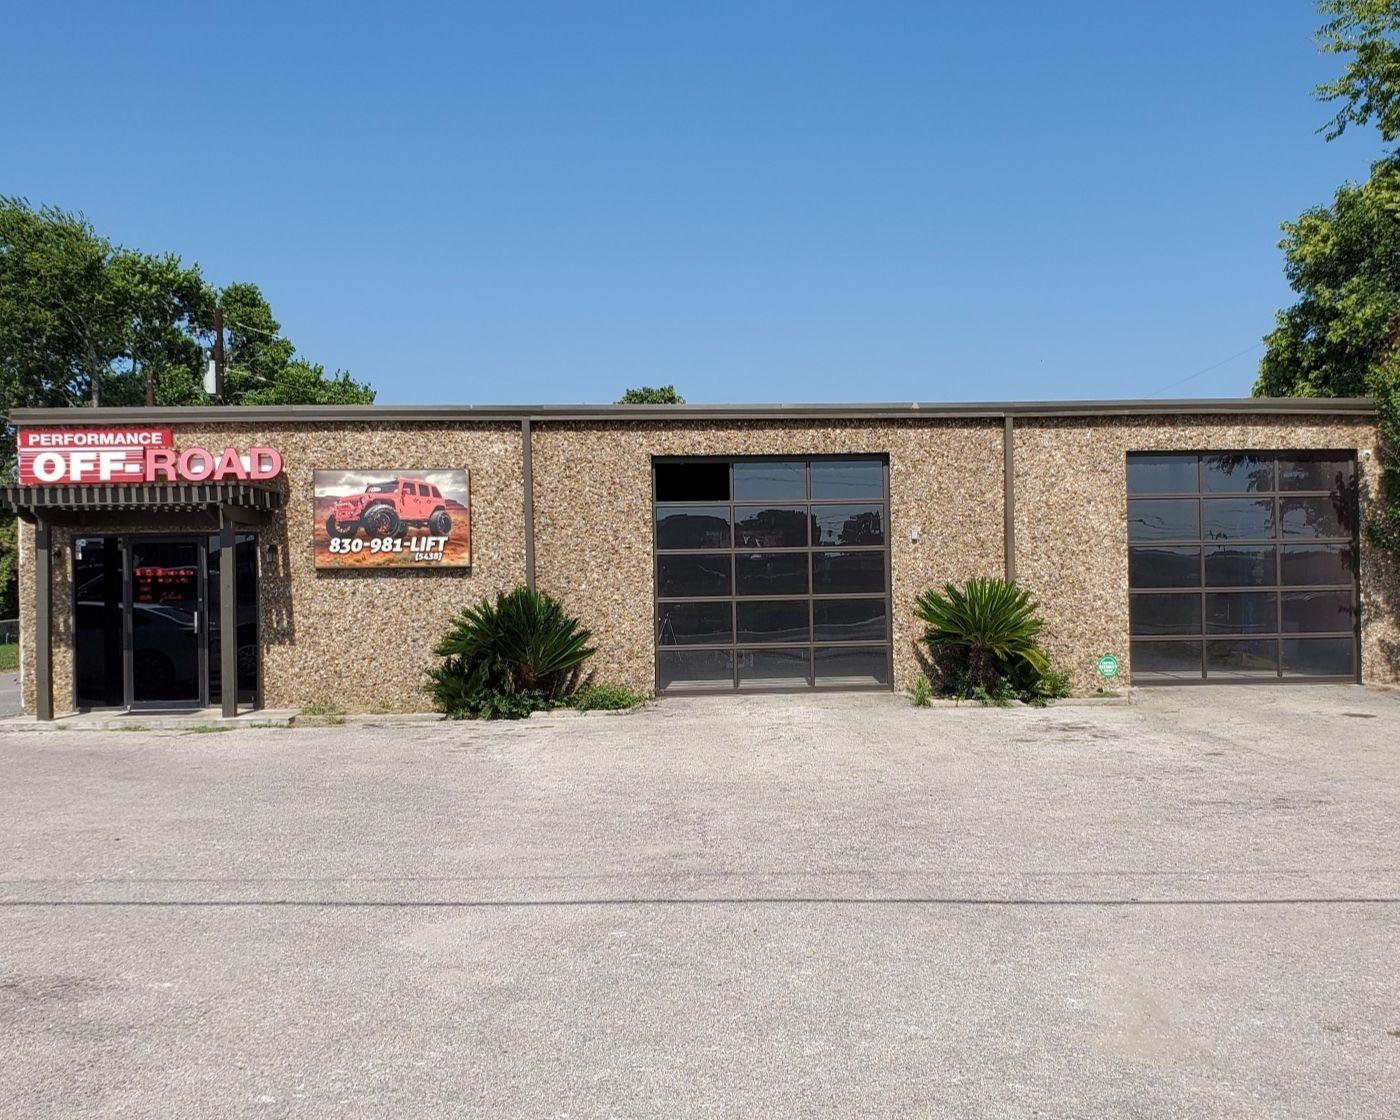 AUTOMOTIVE RETAIL/SHOP IN BOERNE, TX